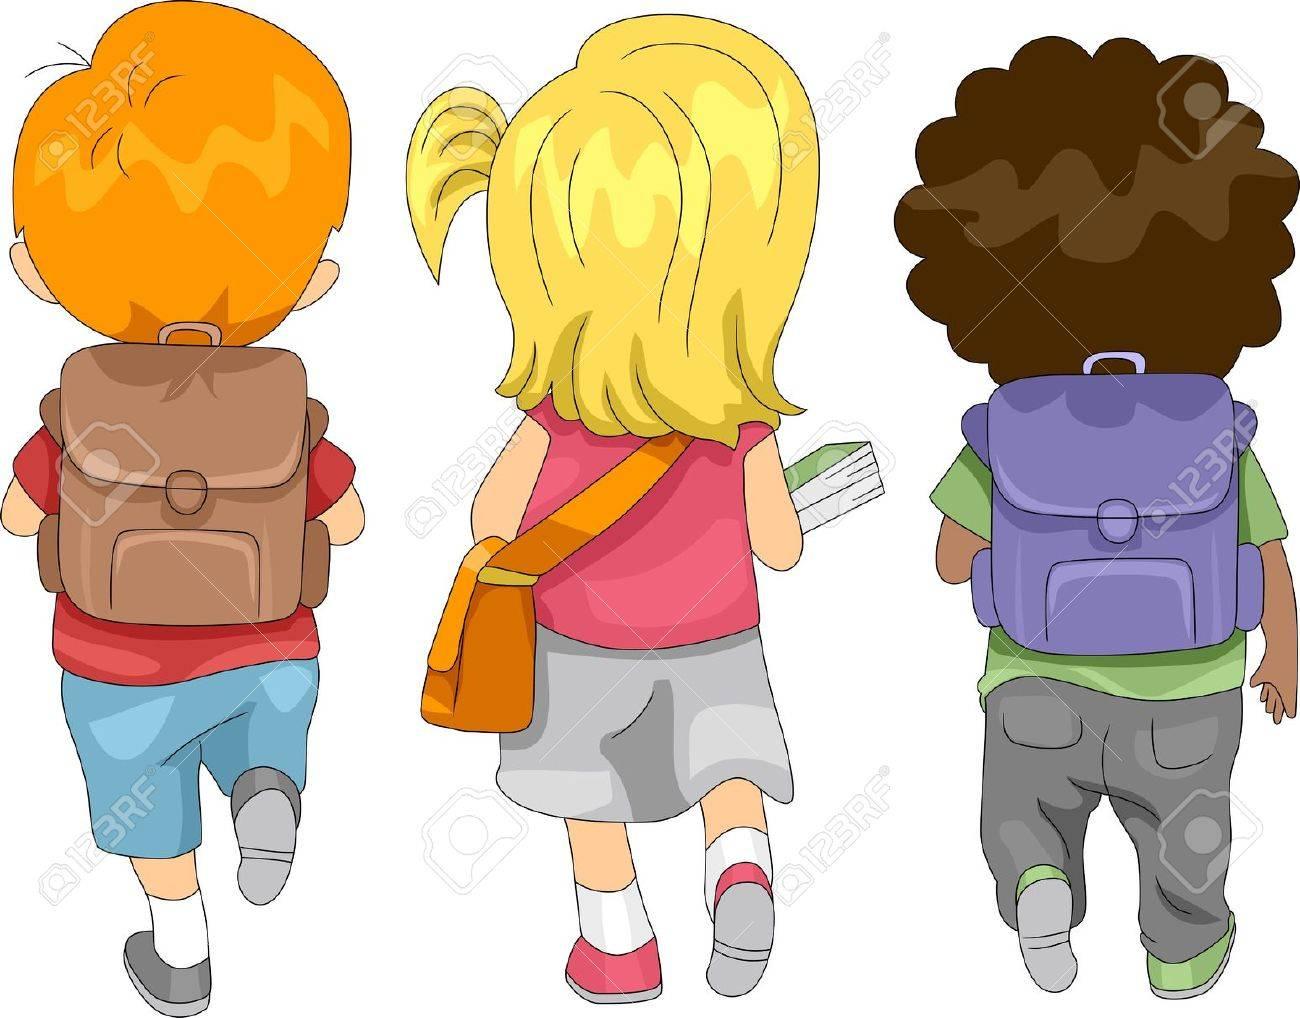 Illustration of Kids Going to School Stock Photo - 10433033